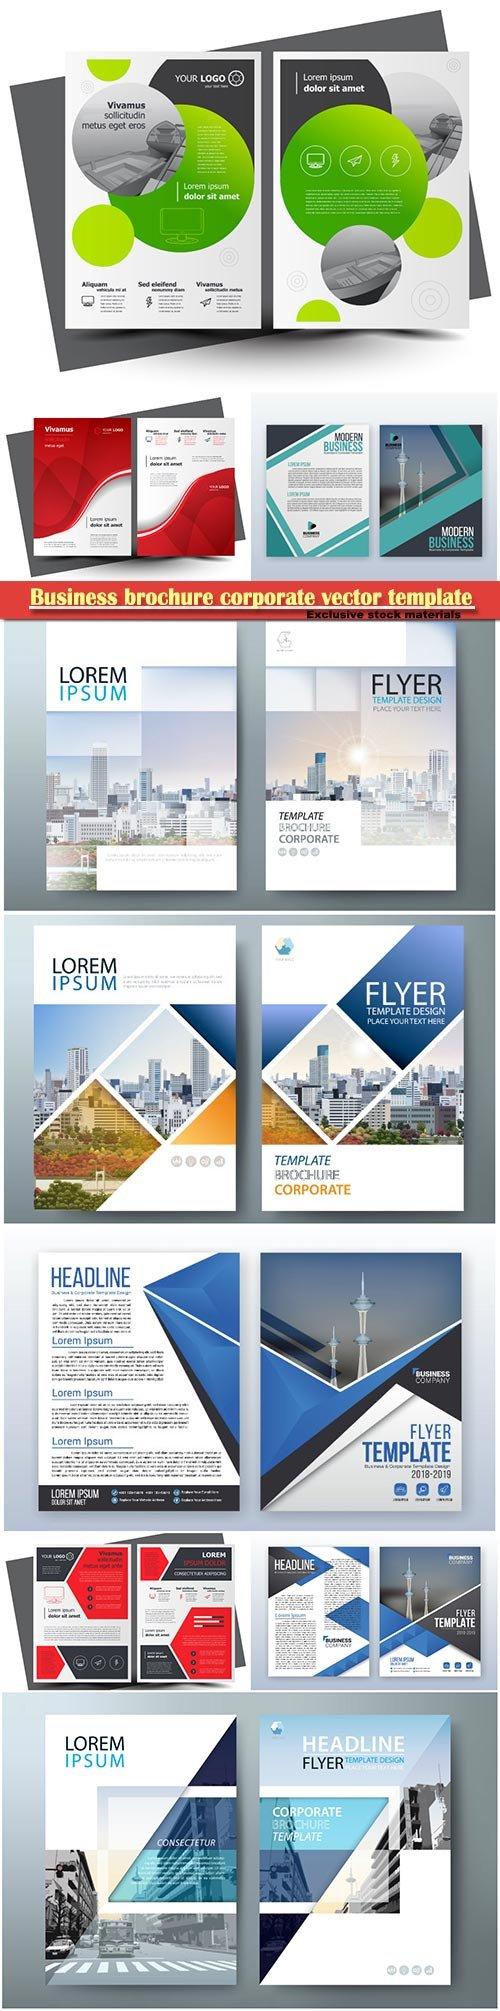 Business brochure corporate vector template, magazine flyer mockup # 12